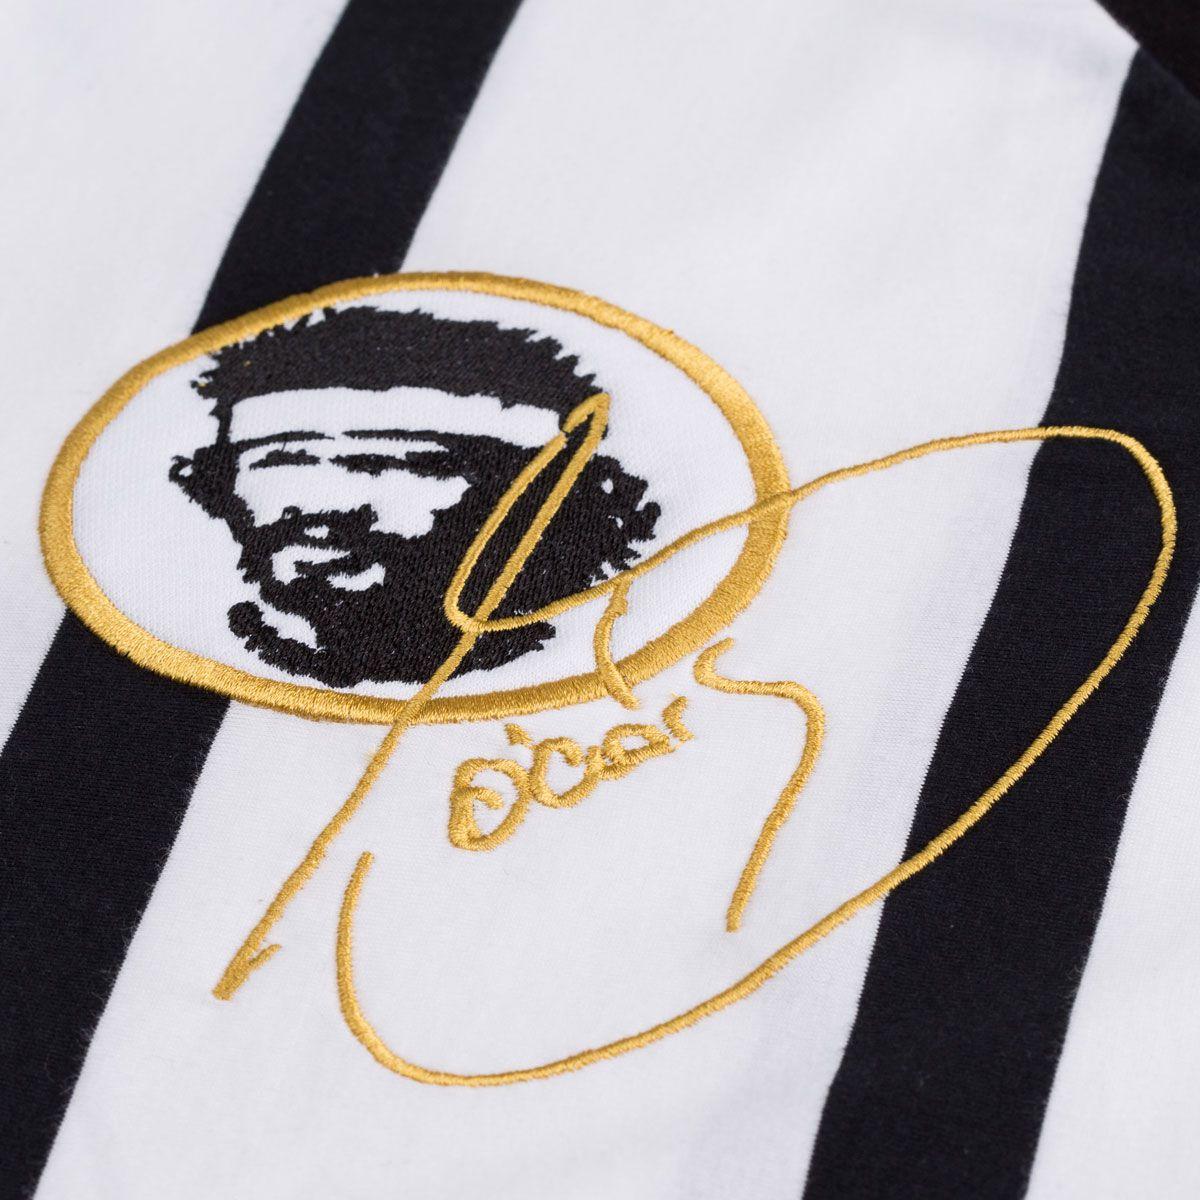 Camisa Retrô Gol Réplica Sócrates Ex - Corinthians 1983 Away